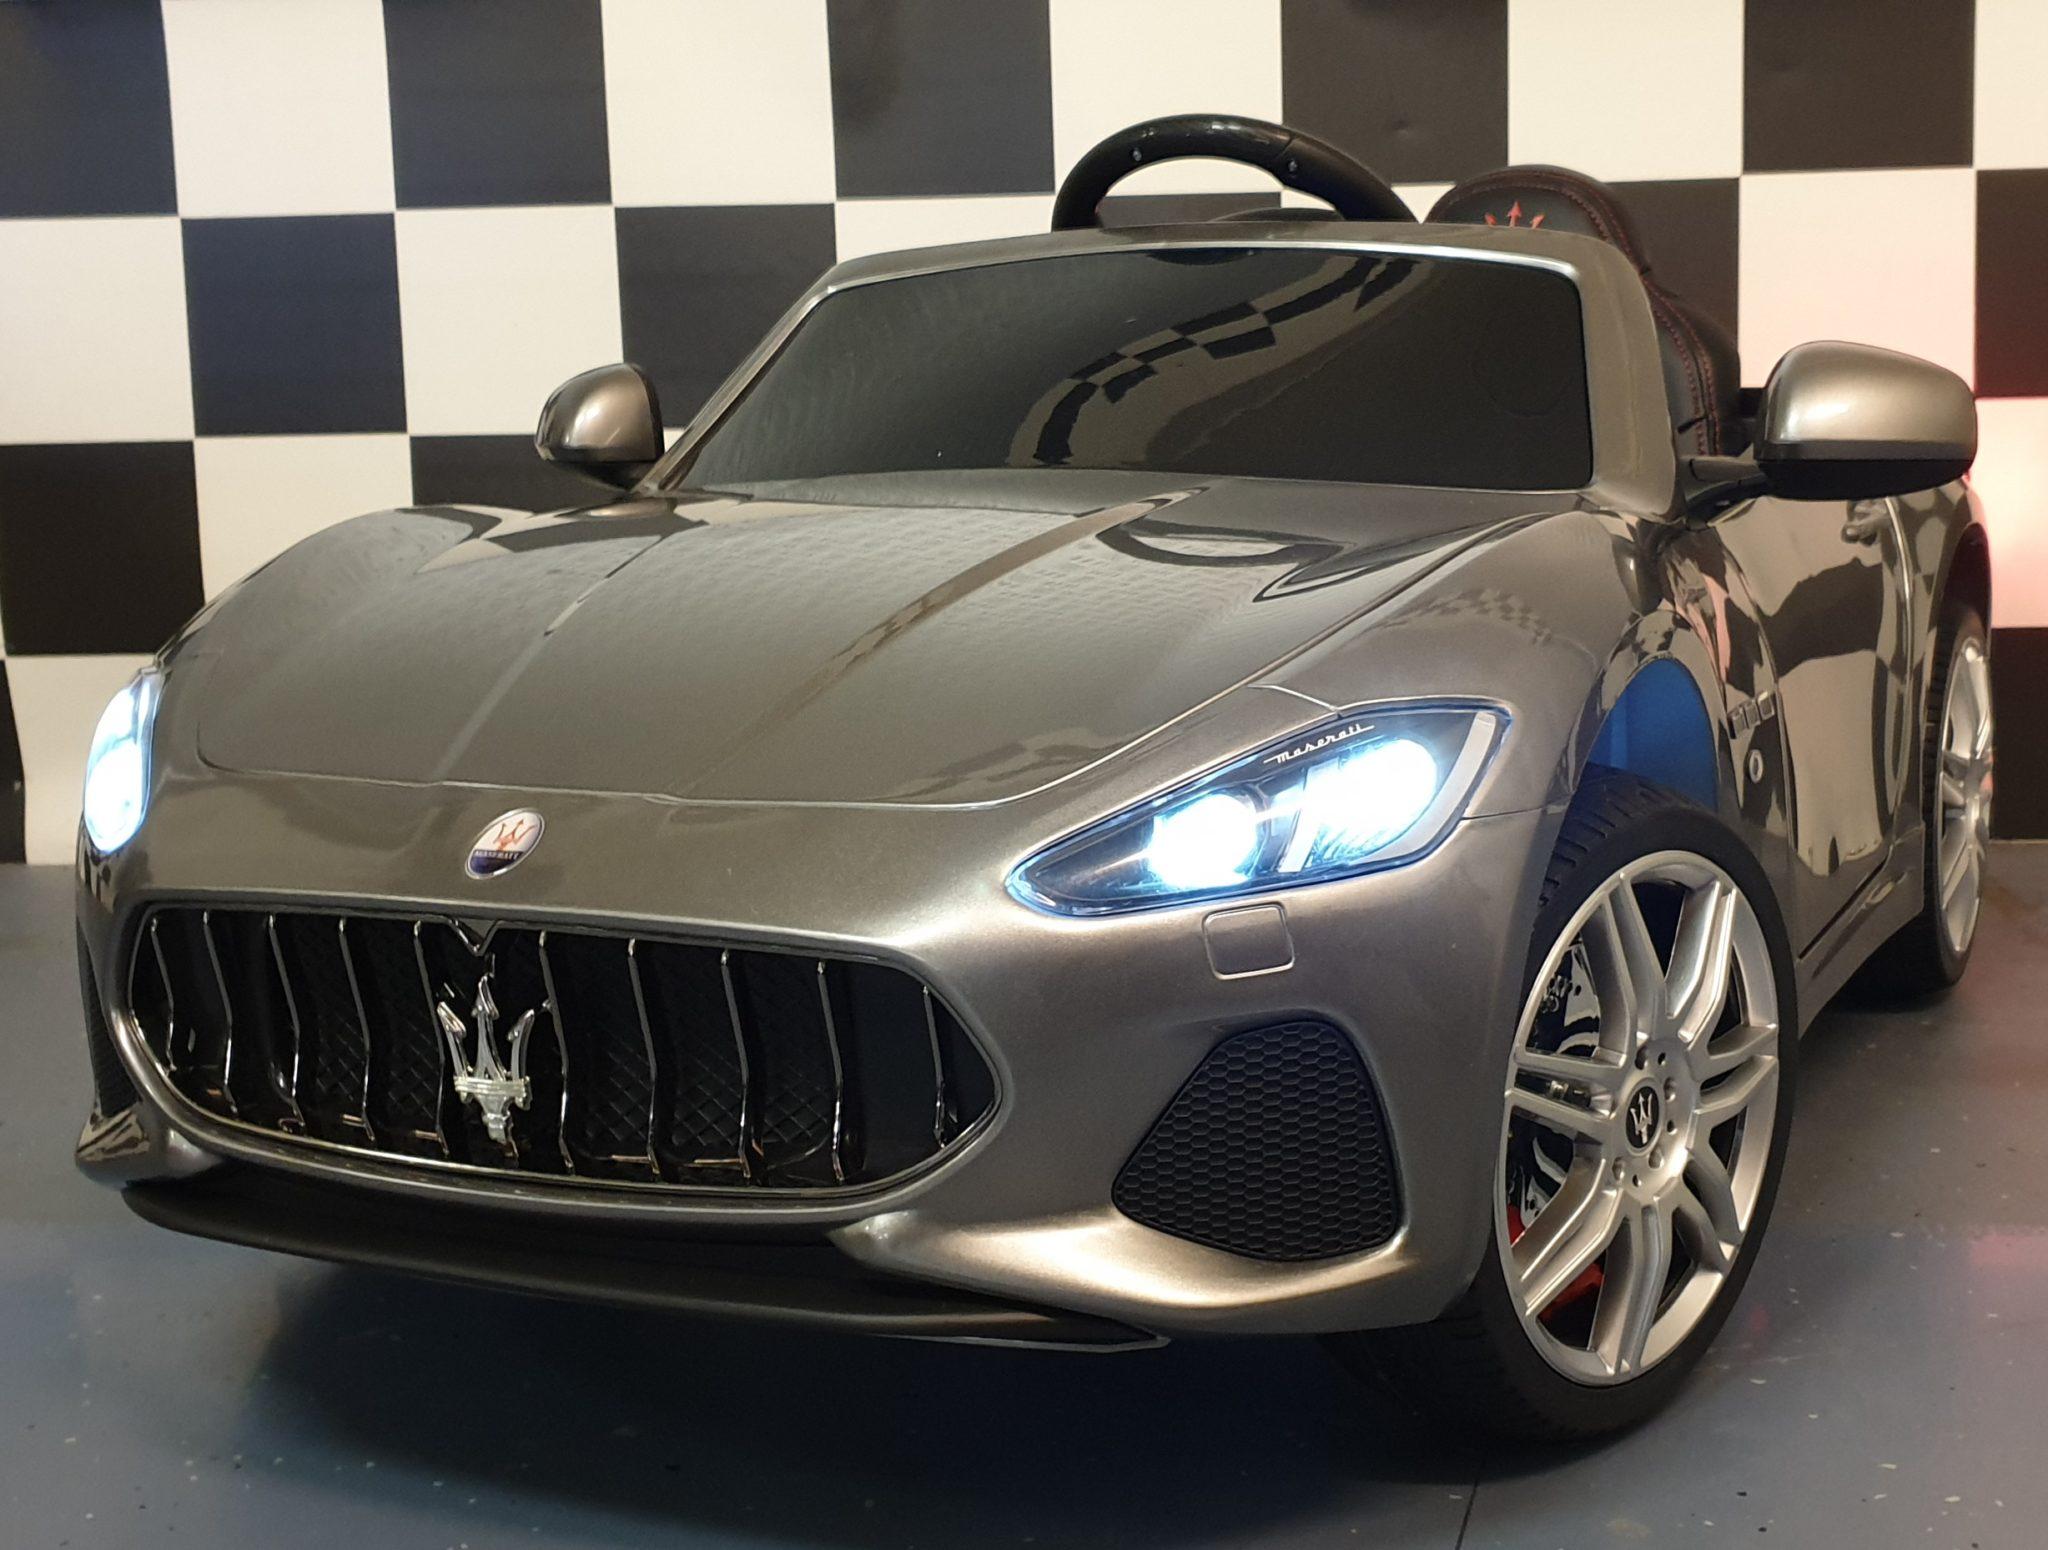 Maserati Grand Cabrio accu kinderauto 12V metallic grijs